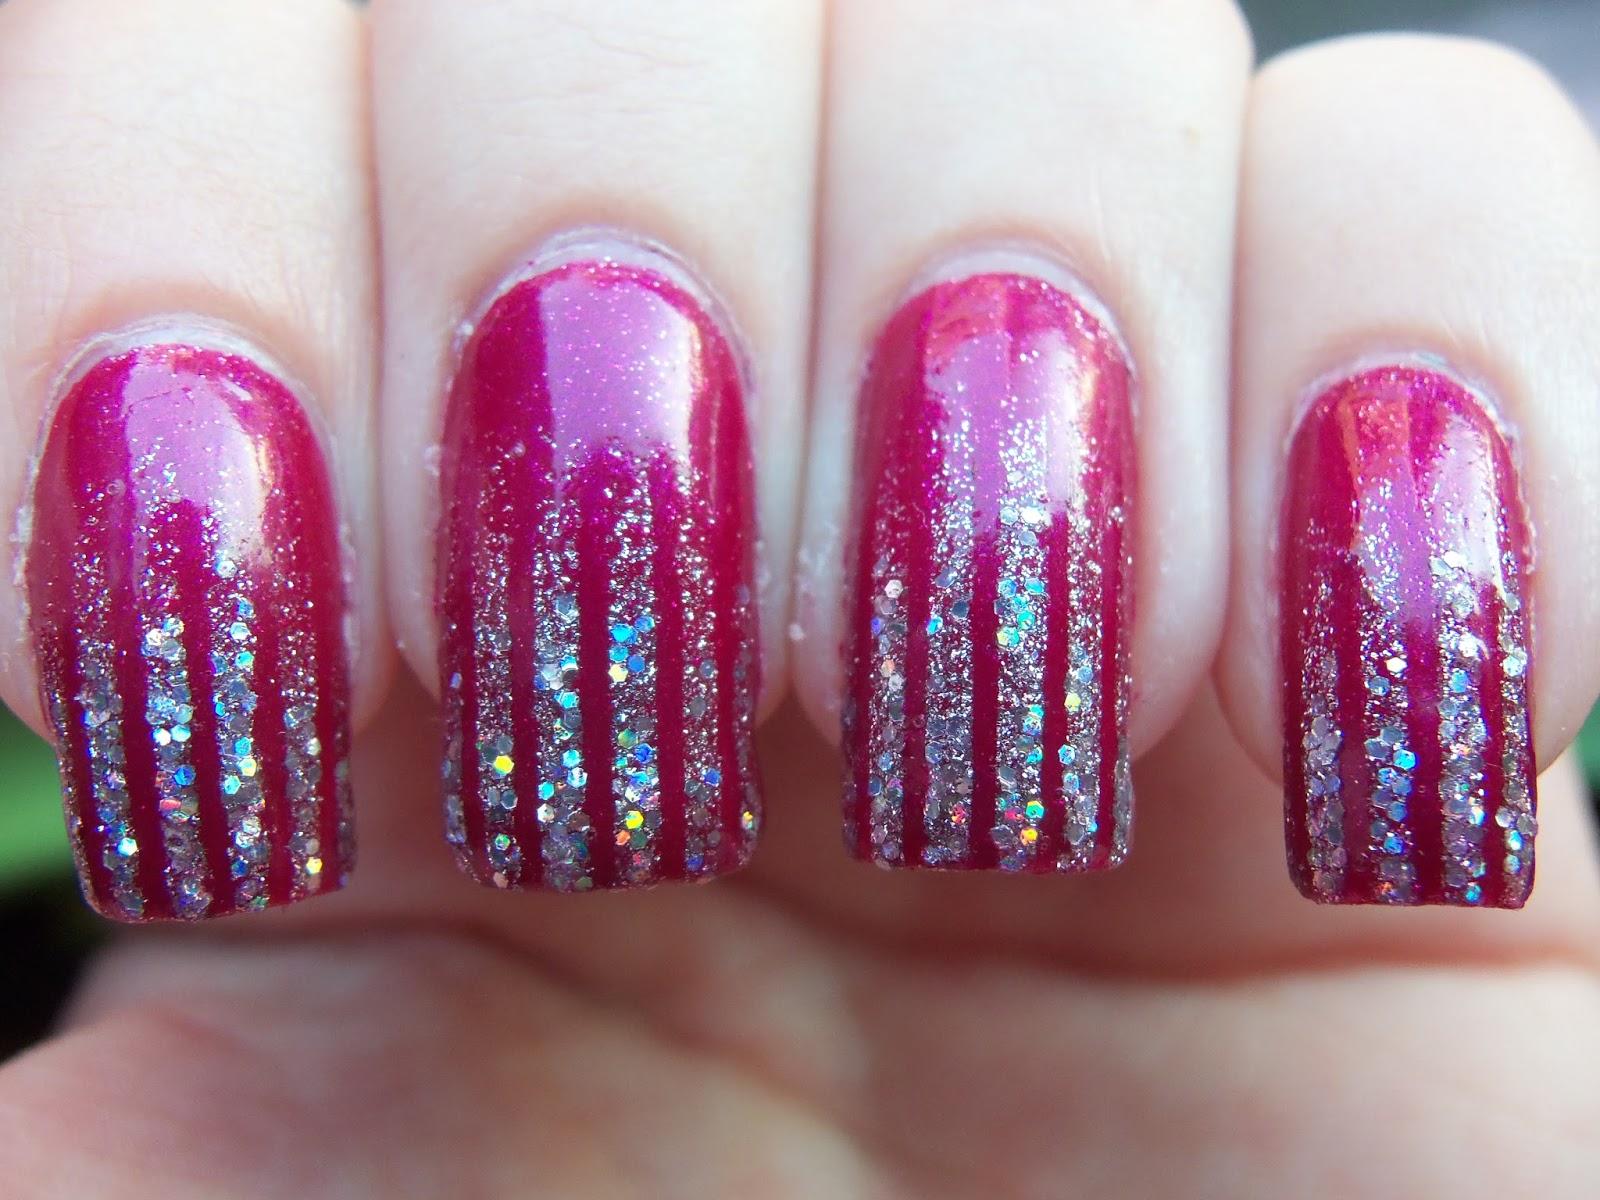 http://megsmanicures.blogspot.com/2014/01/got-polish-challenge-pink.html